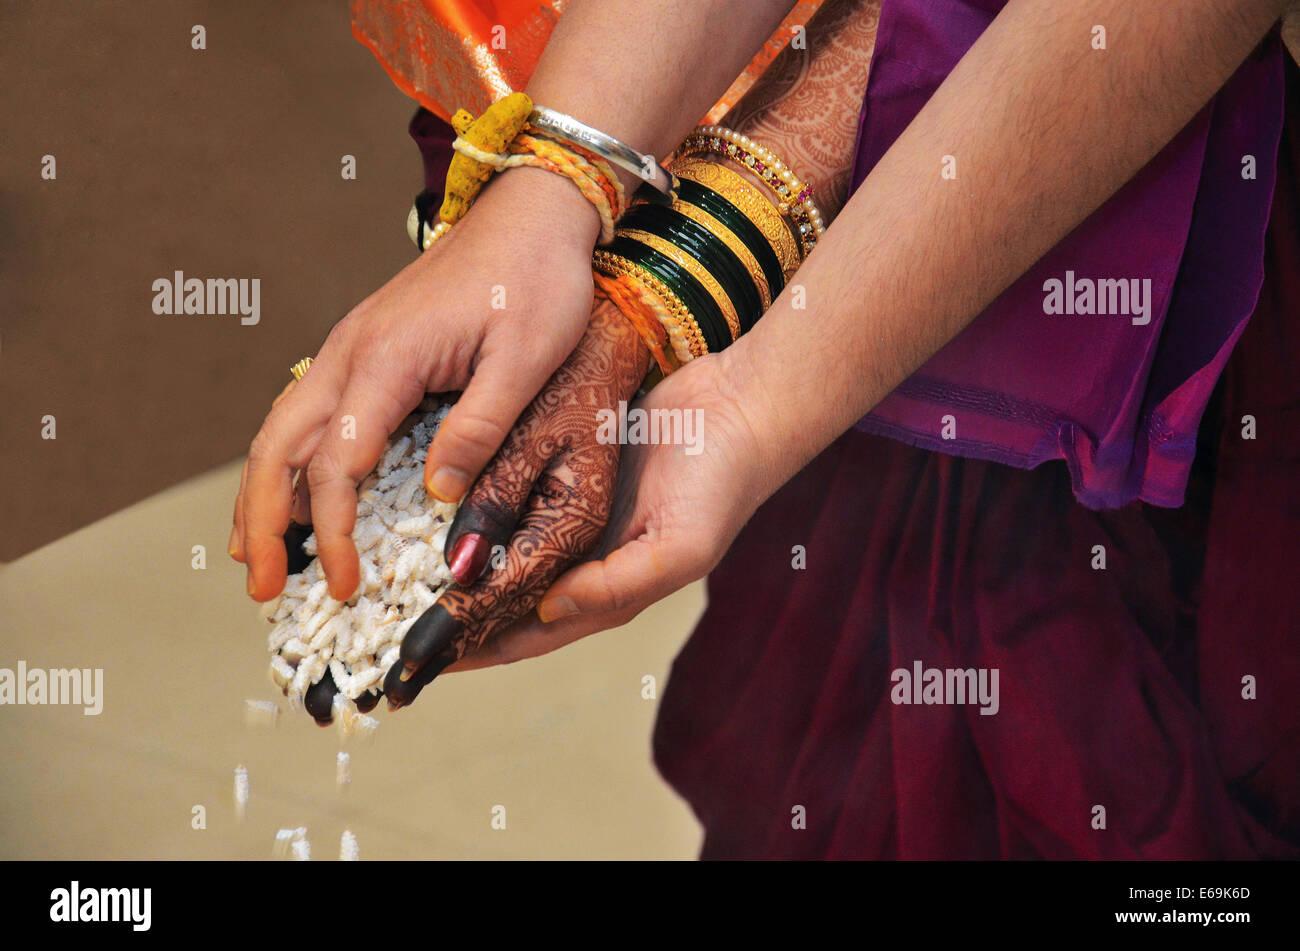 Vivaha homa wedding ritual rite of throwing rice flakes into sacrificial fire Pune, Maharashtra - Stock Image